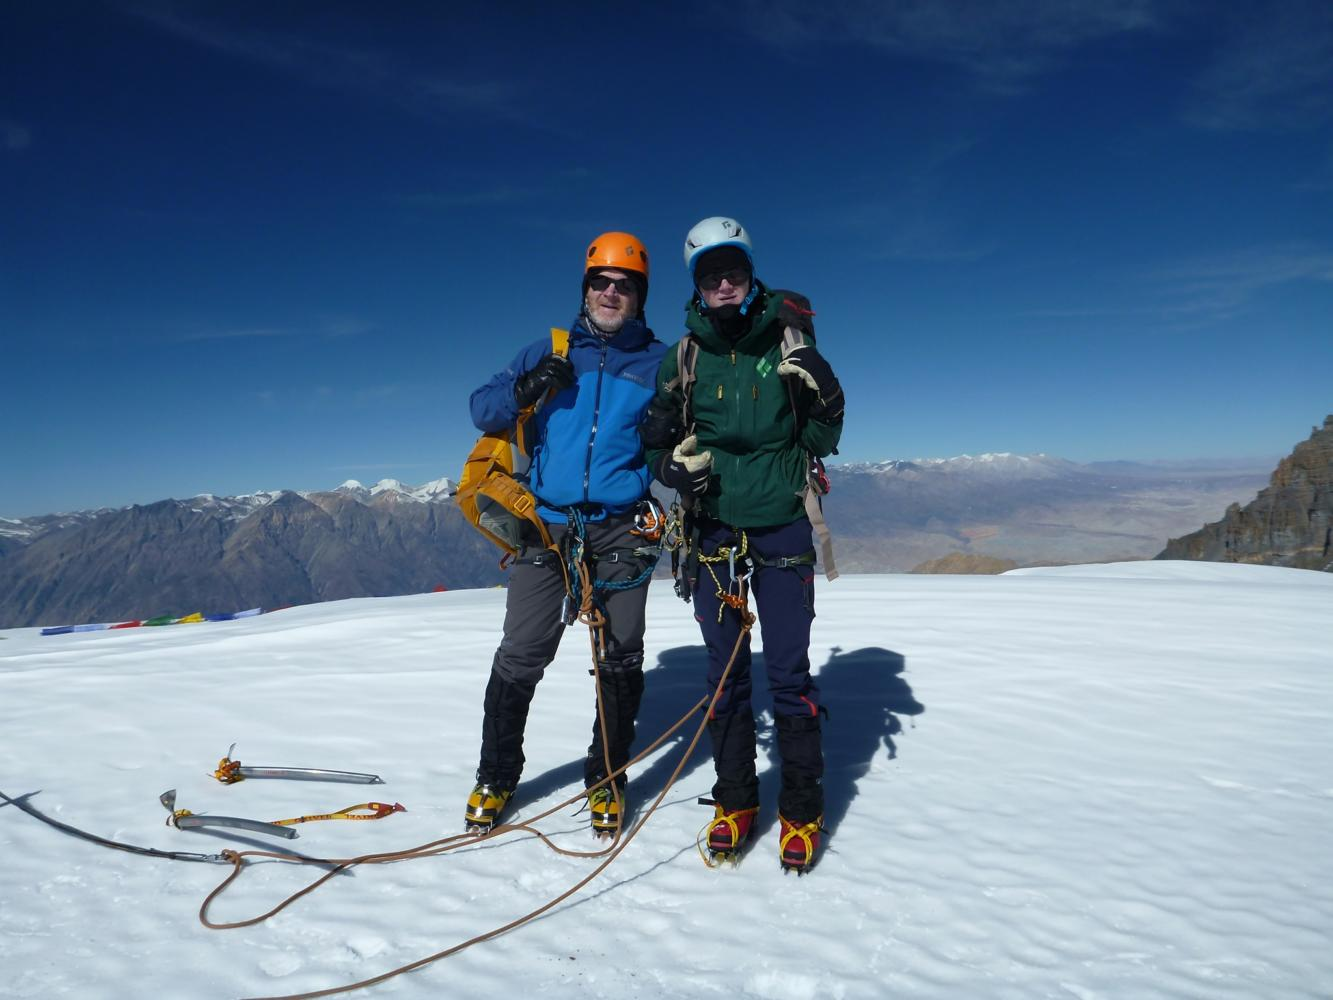 Christian Whisenant poses with his father Jonathon Whisenant while trekking in Nepal.